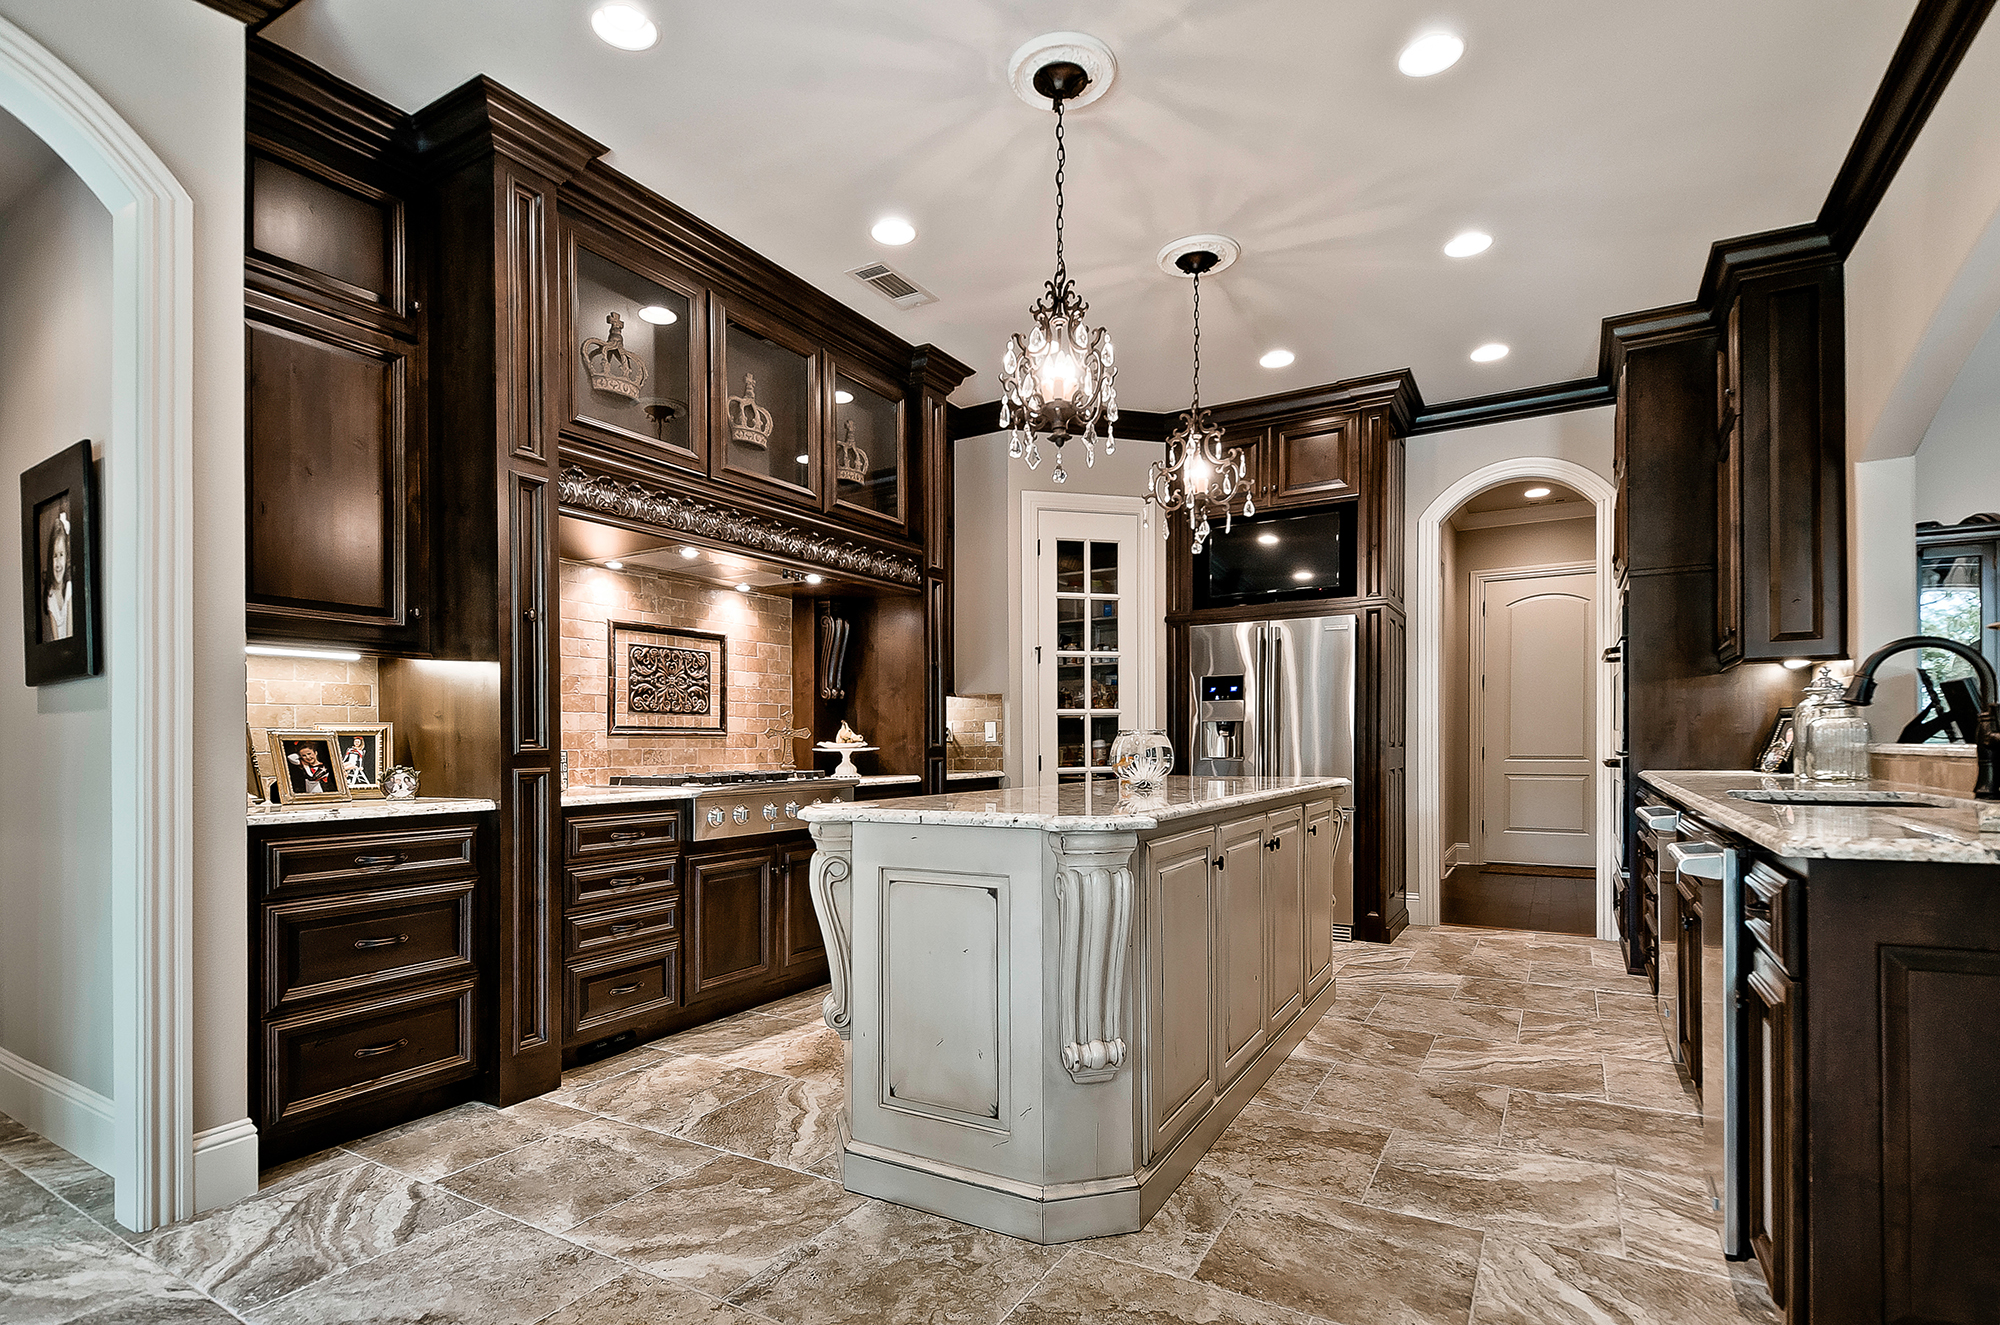 Knotty Alder Cabinets With Walnut Stain Cabinets Matttroy